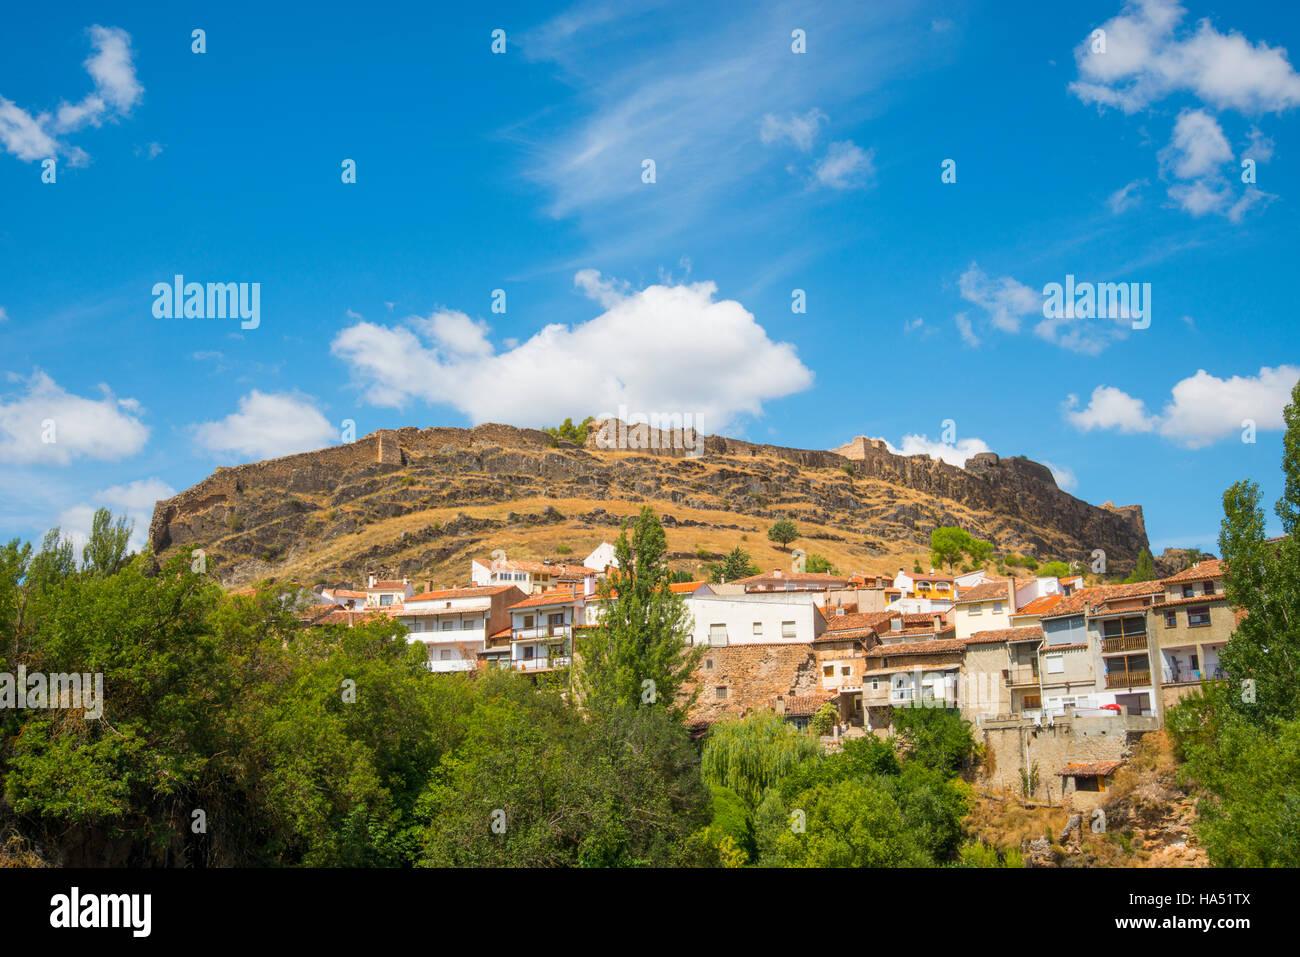 Overview. Cañete, Cuenca province, Castilla La Mancha, Spain. - Stock Image